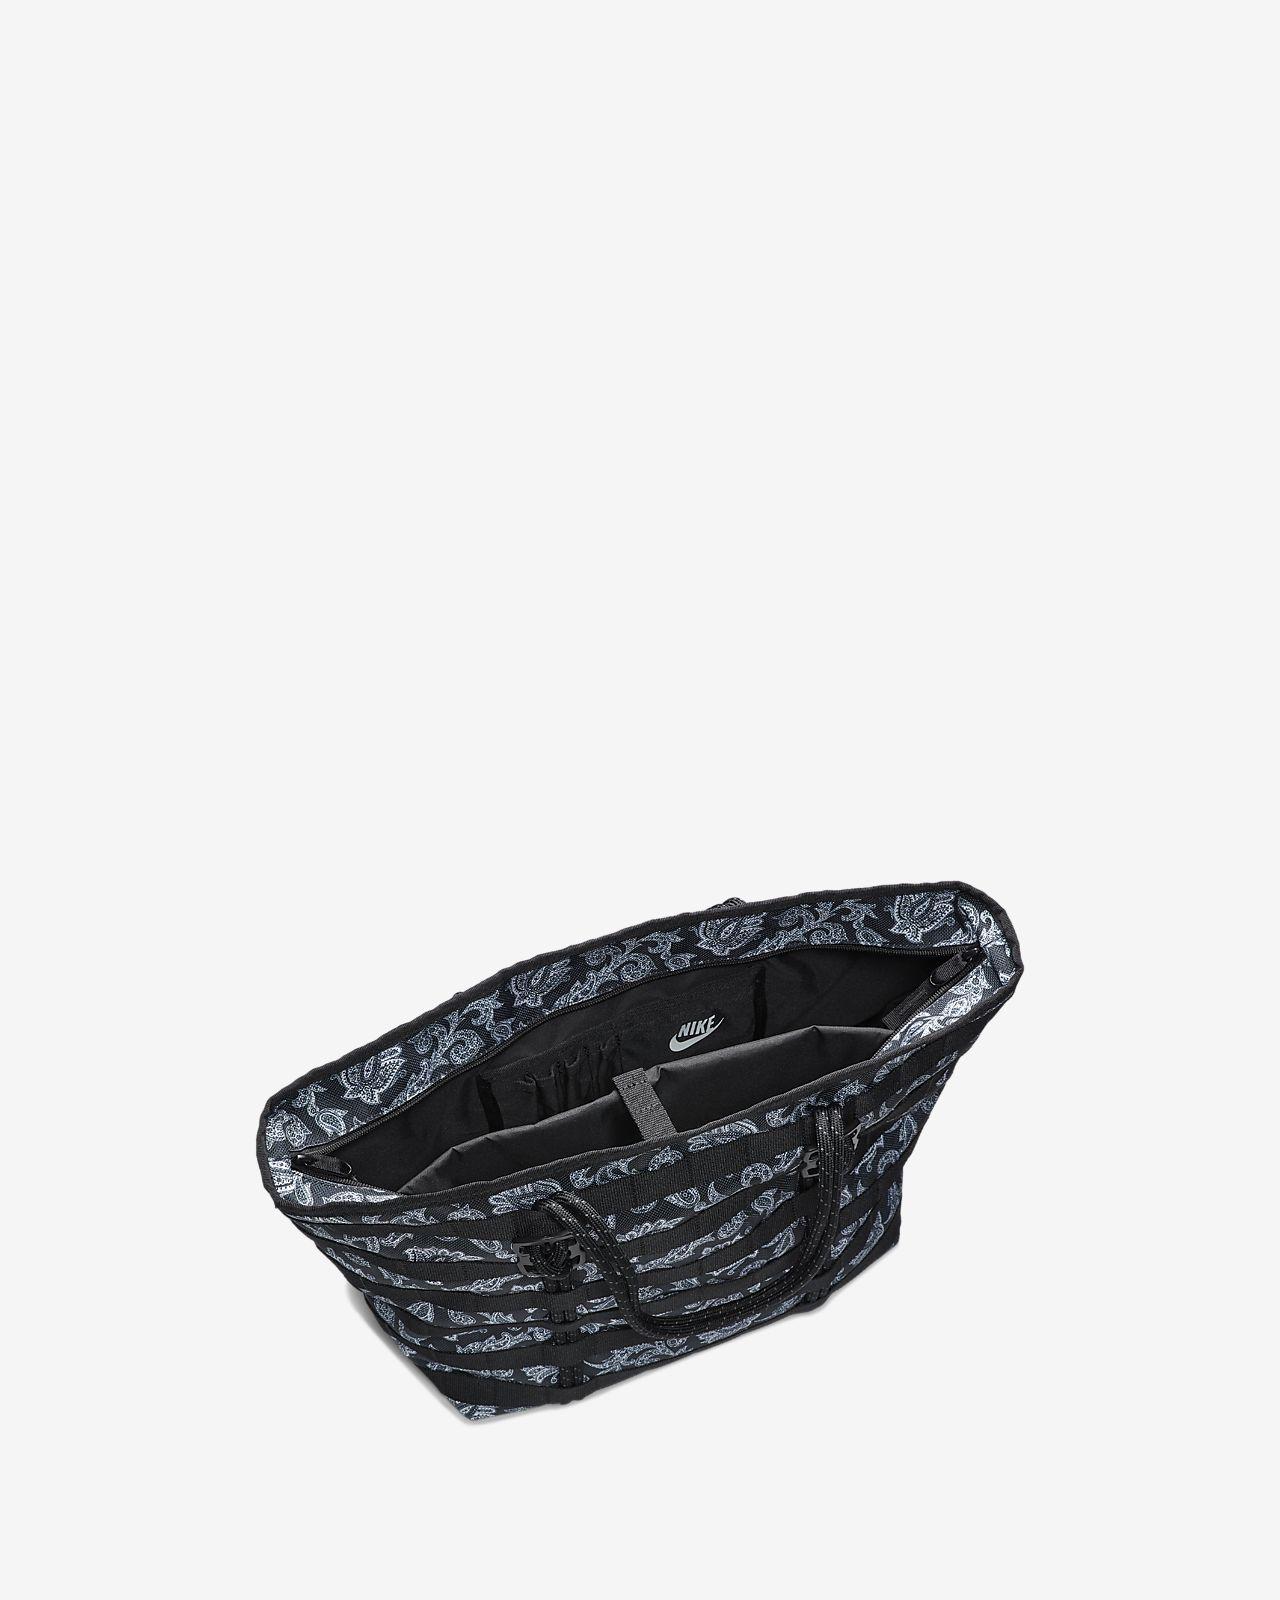 d1e4652b82 Low Resolution Τσάντα ώμου Nike AF1 Τσάντα ώμου Nike AF1